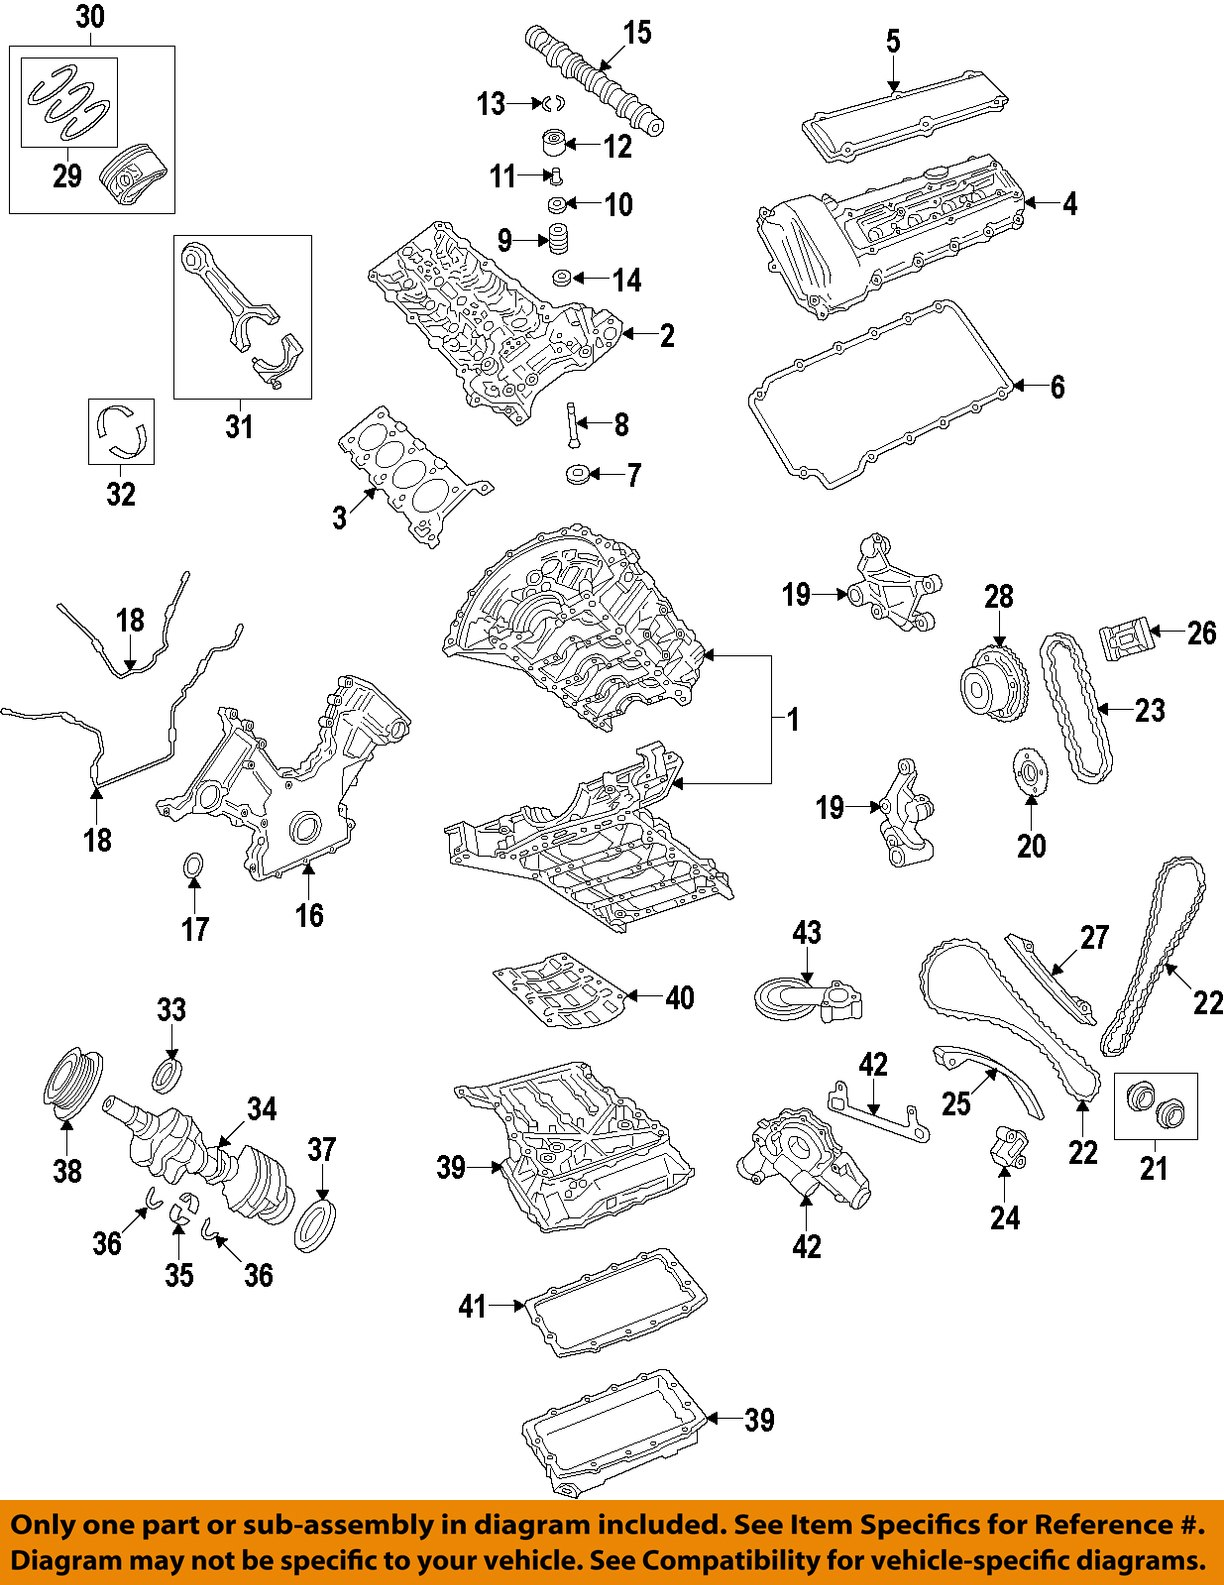 Jaguar Xj8 Engine Diagram Books Of Wiring Xk8 Oem 98 09 Timing Chain Tensioner C2a1511 2001 1997